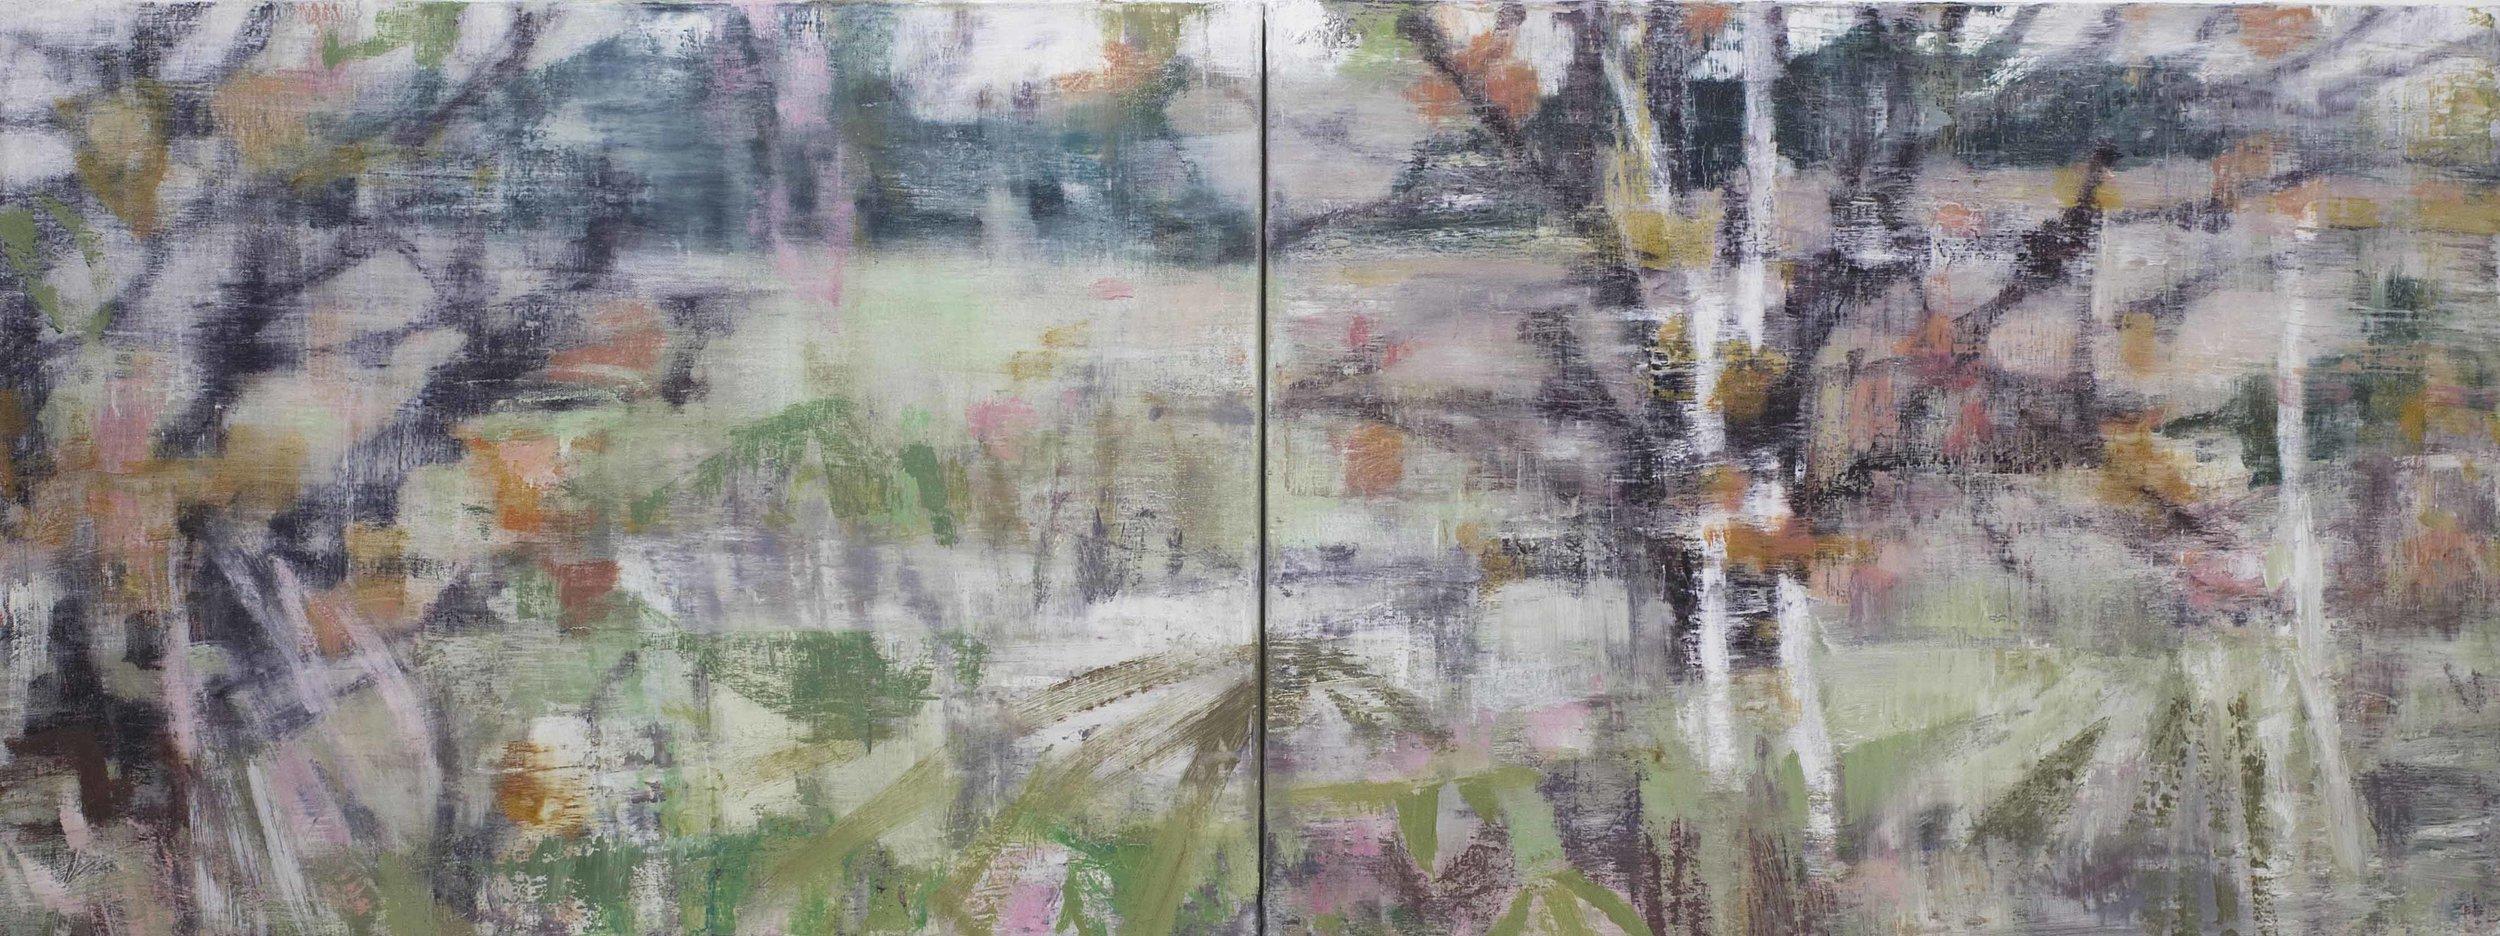 Joanna Logue, Willow - Ducknest Paddock, 2016 , oil on inen, 60 x 160cm